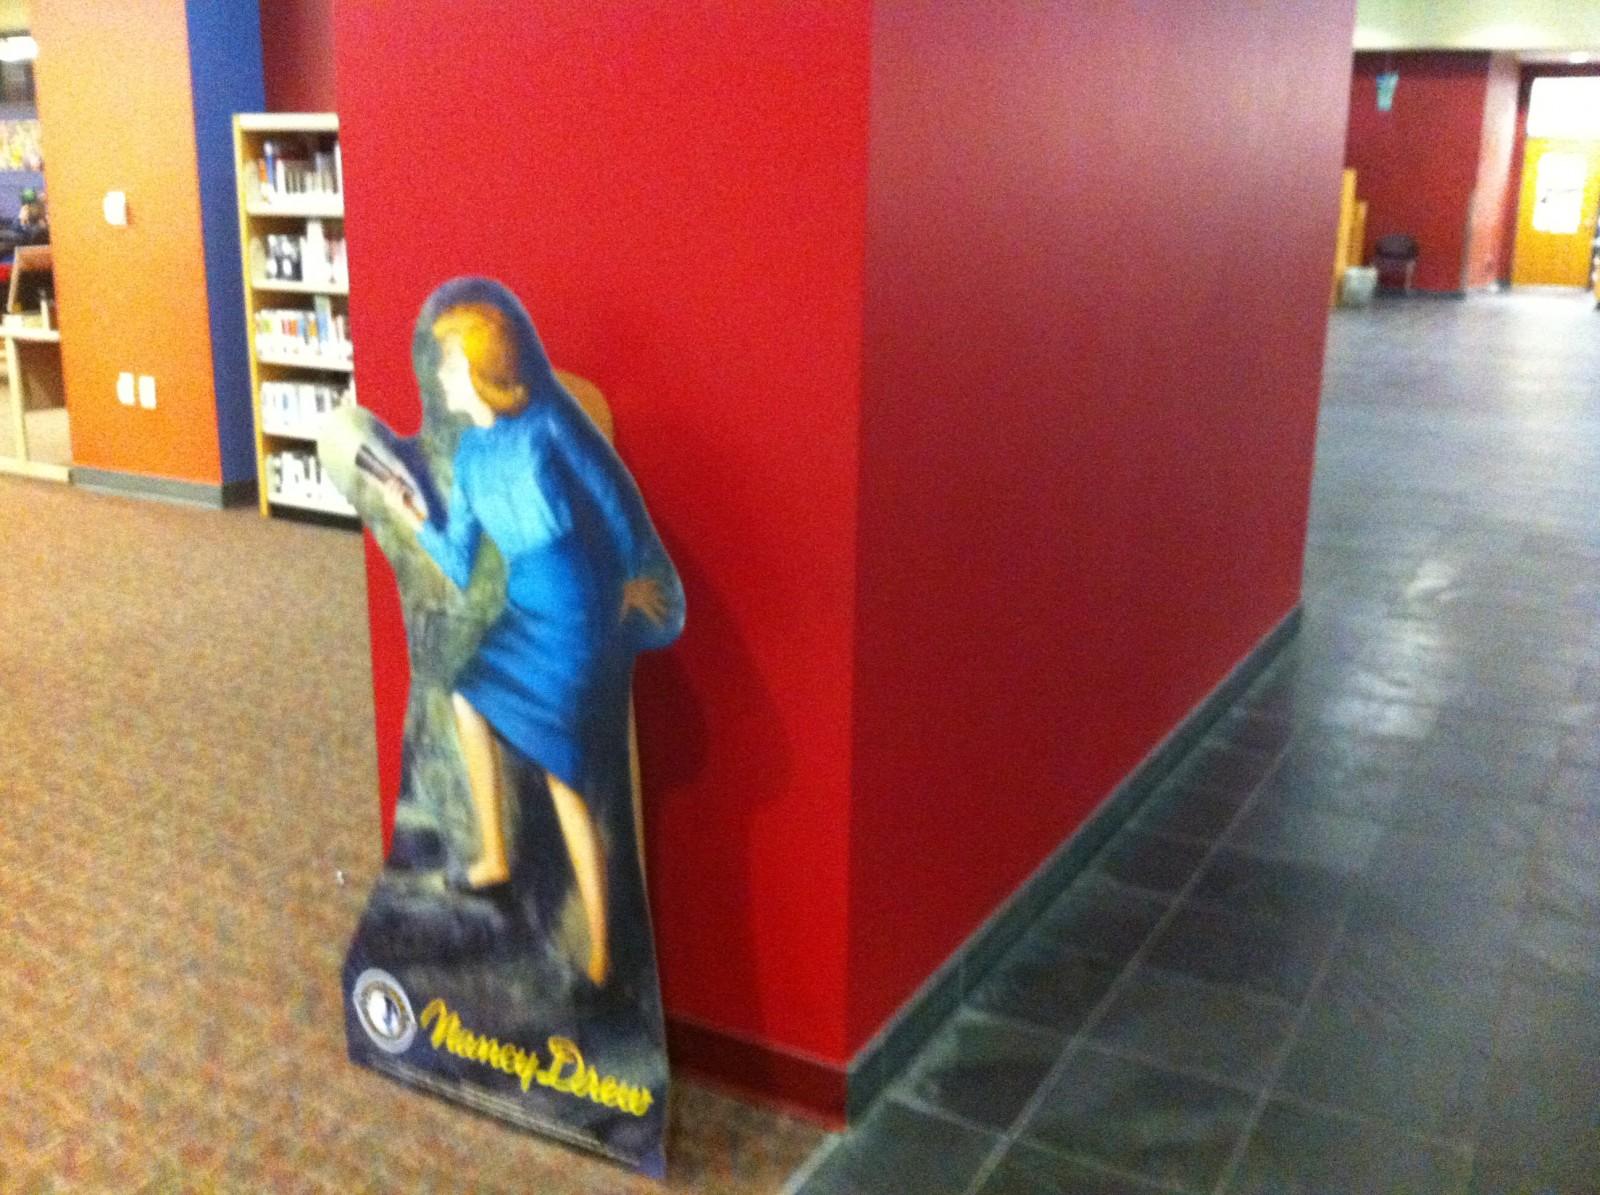 Central library revamp plans revealed